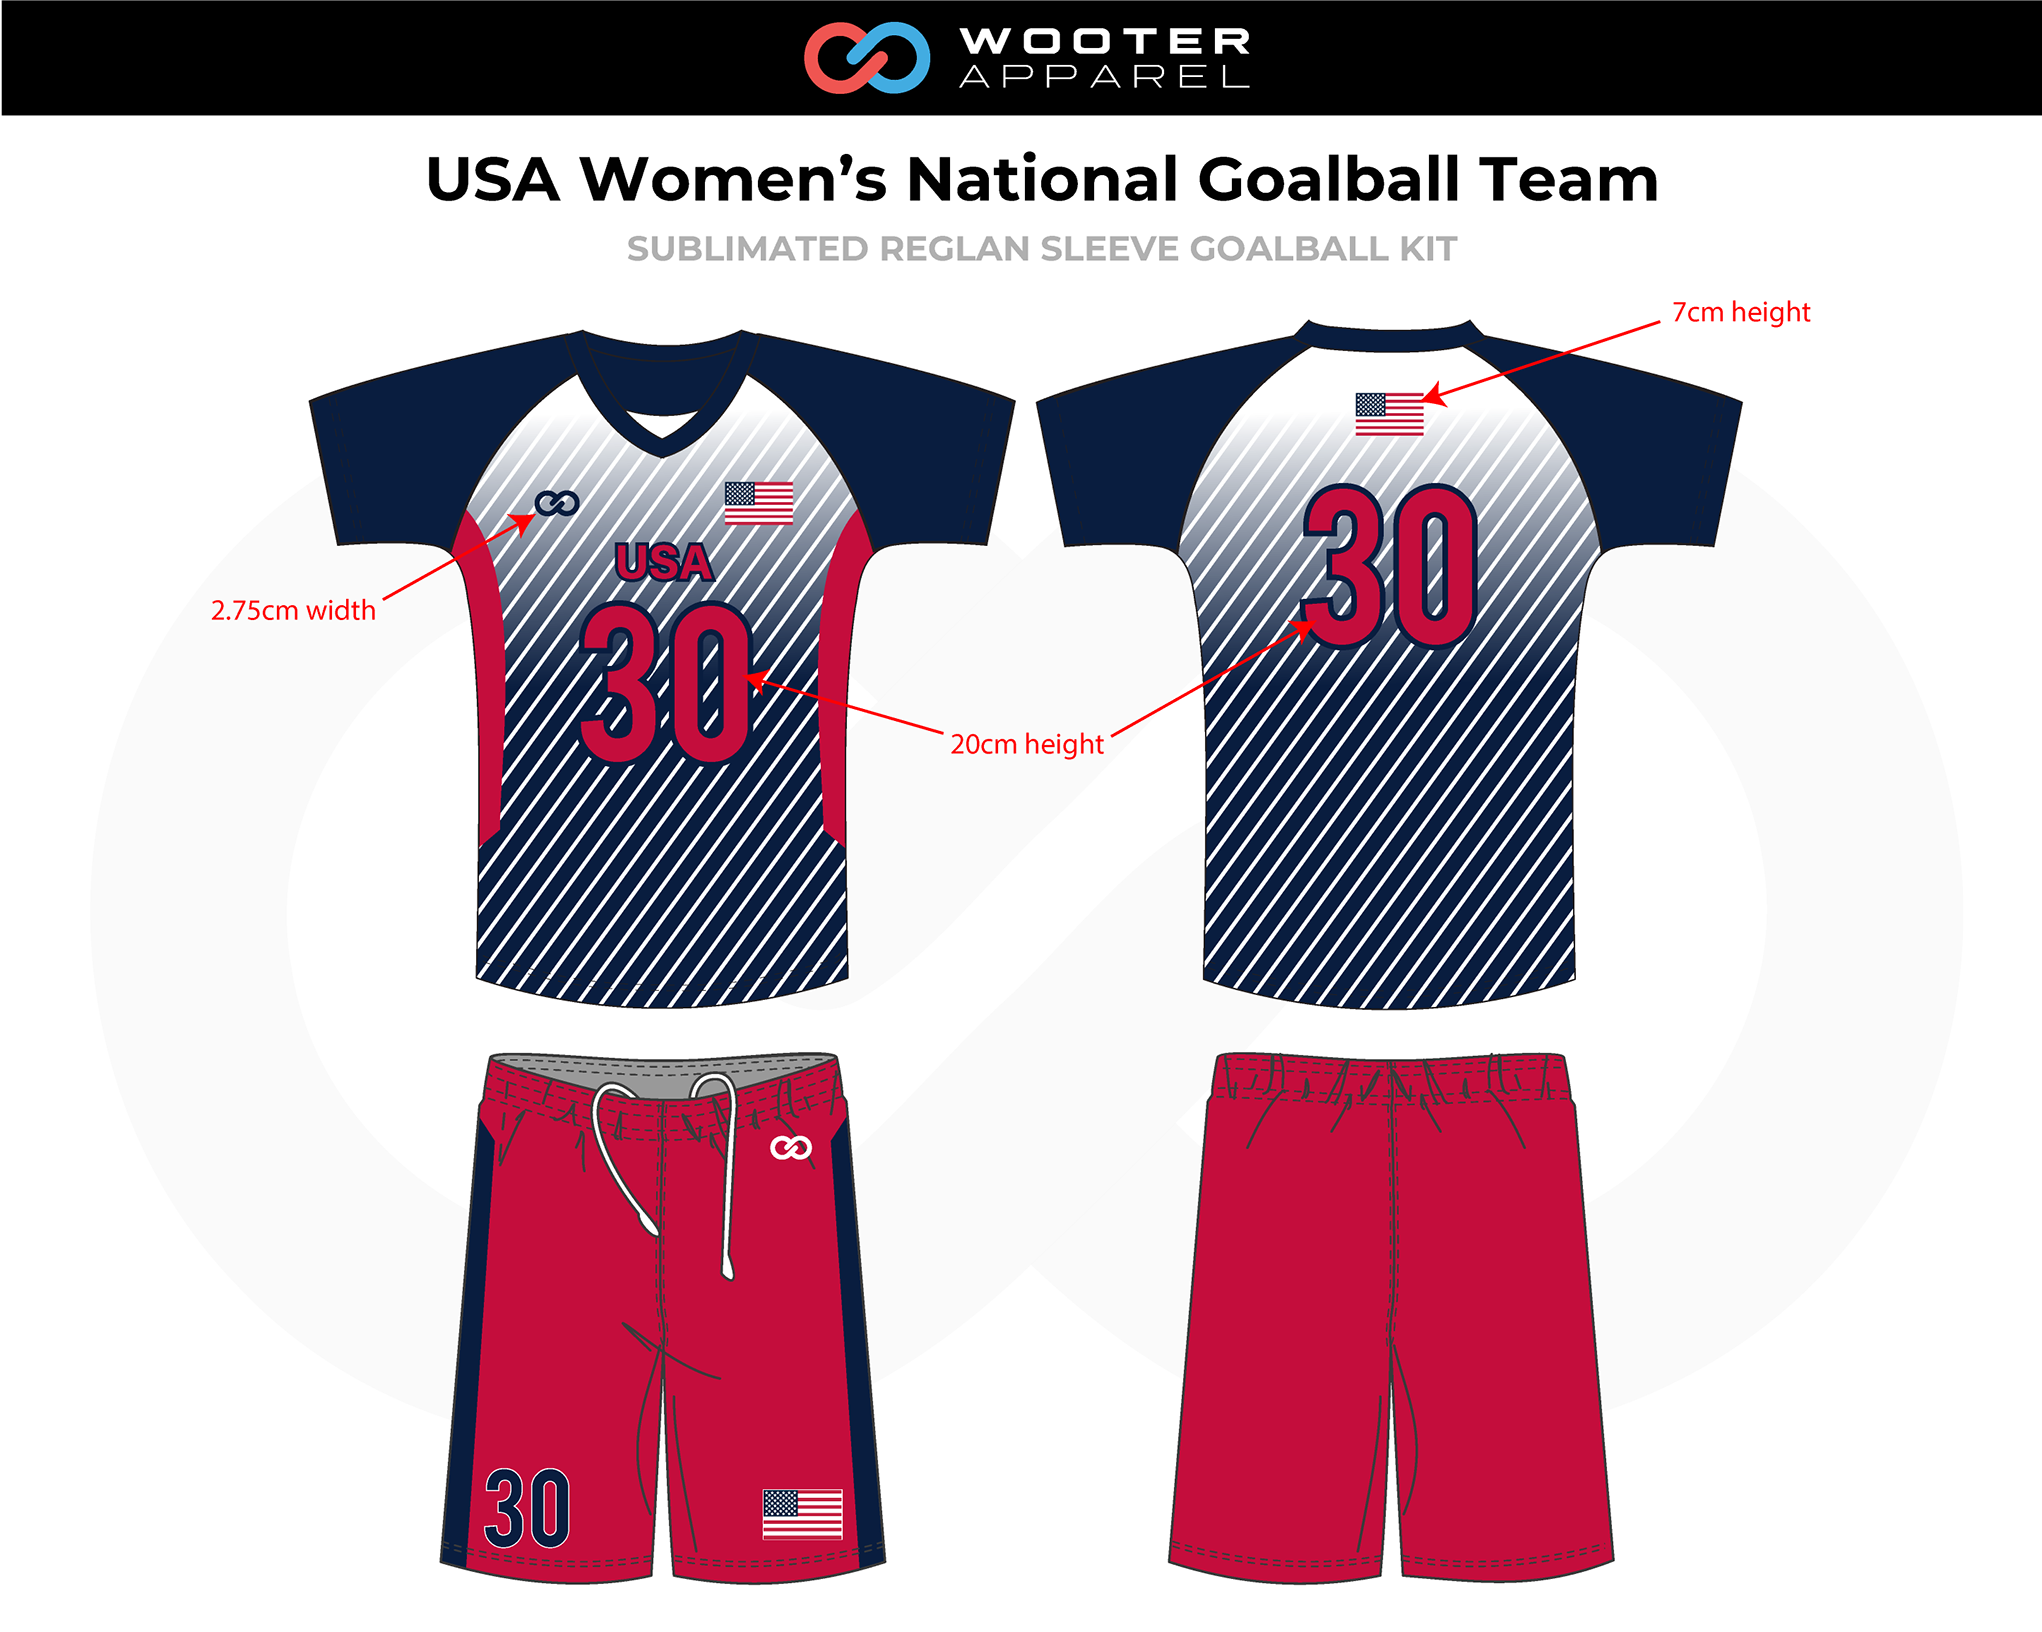 2019-01-09 USA Women's National Goalball Uniform (Option 1).png